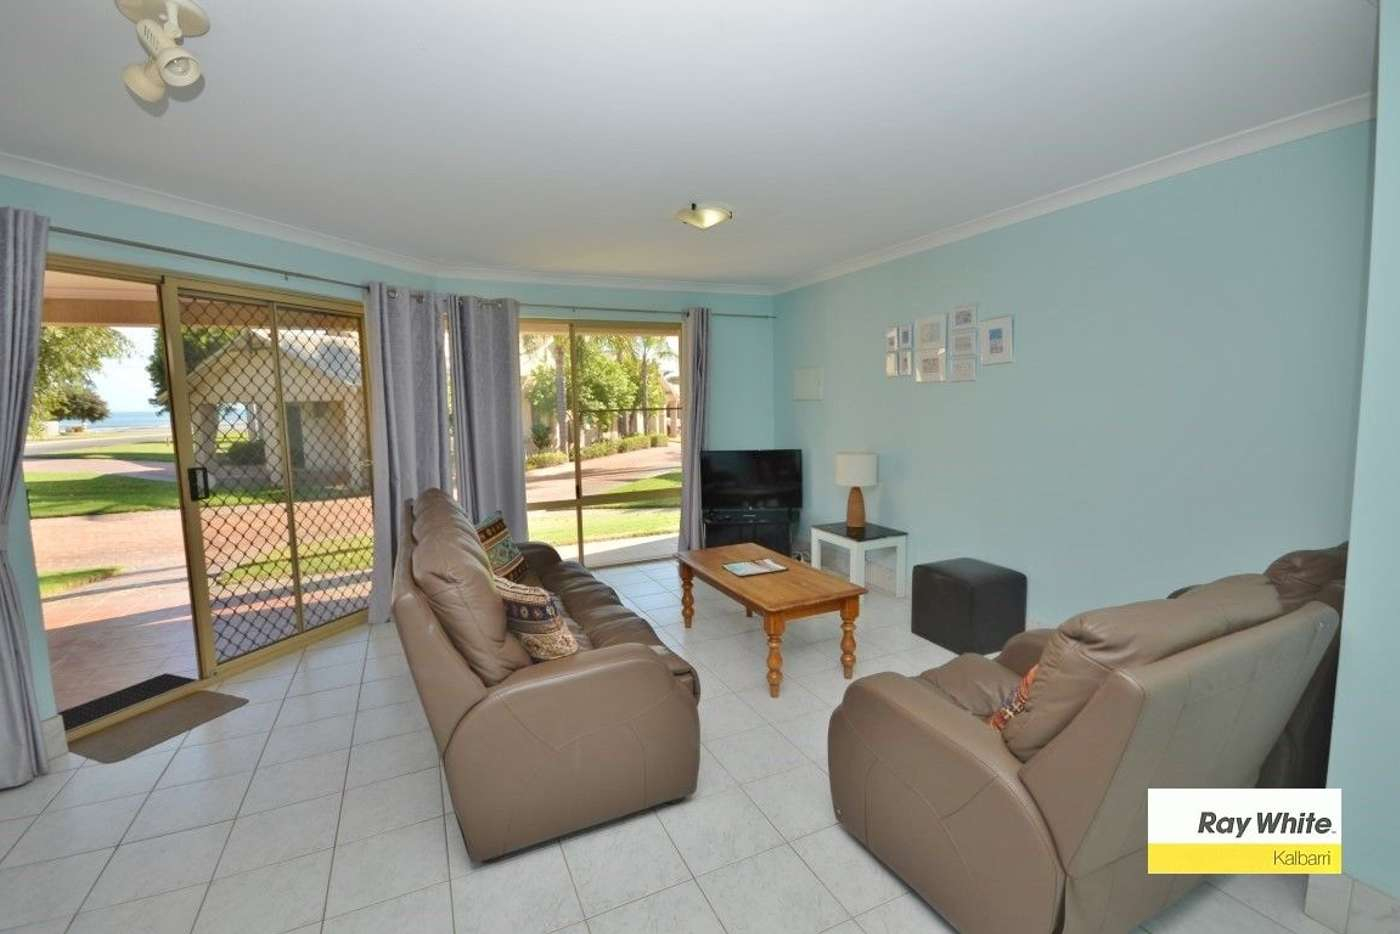 Sixth view of Homely unit listing, 18/22 Grey Street - Pelican Shore Villas, Kalbarri WA 6536